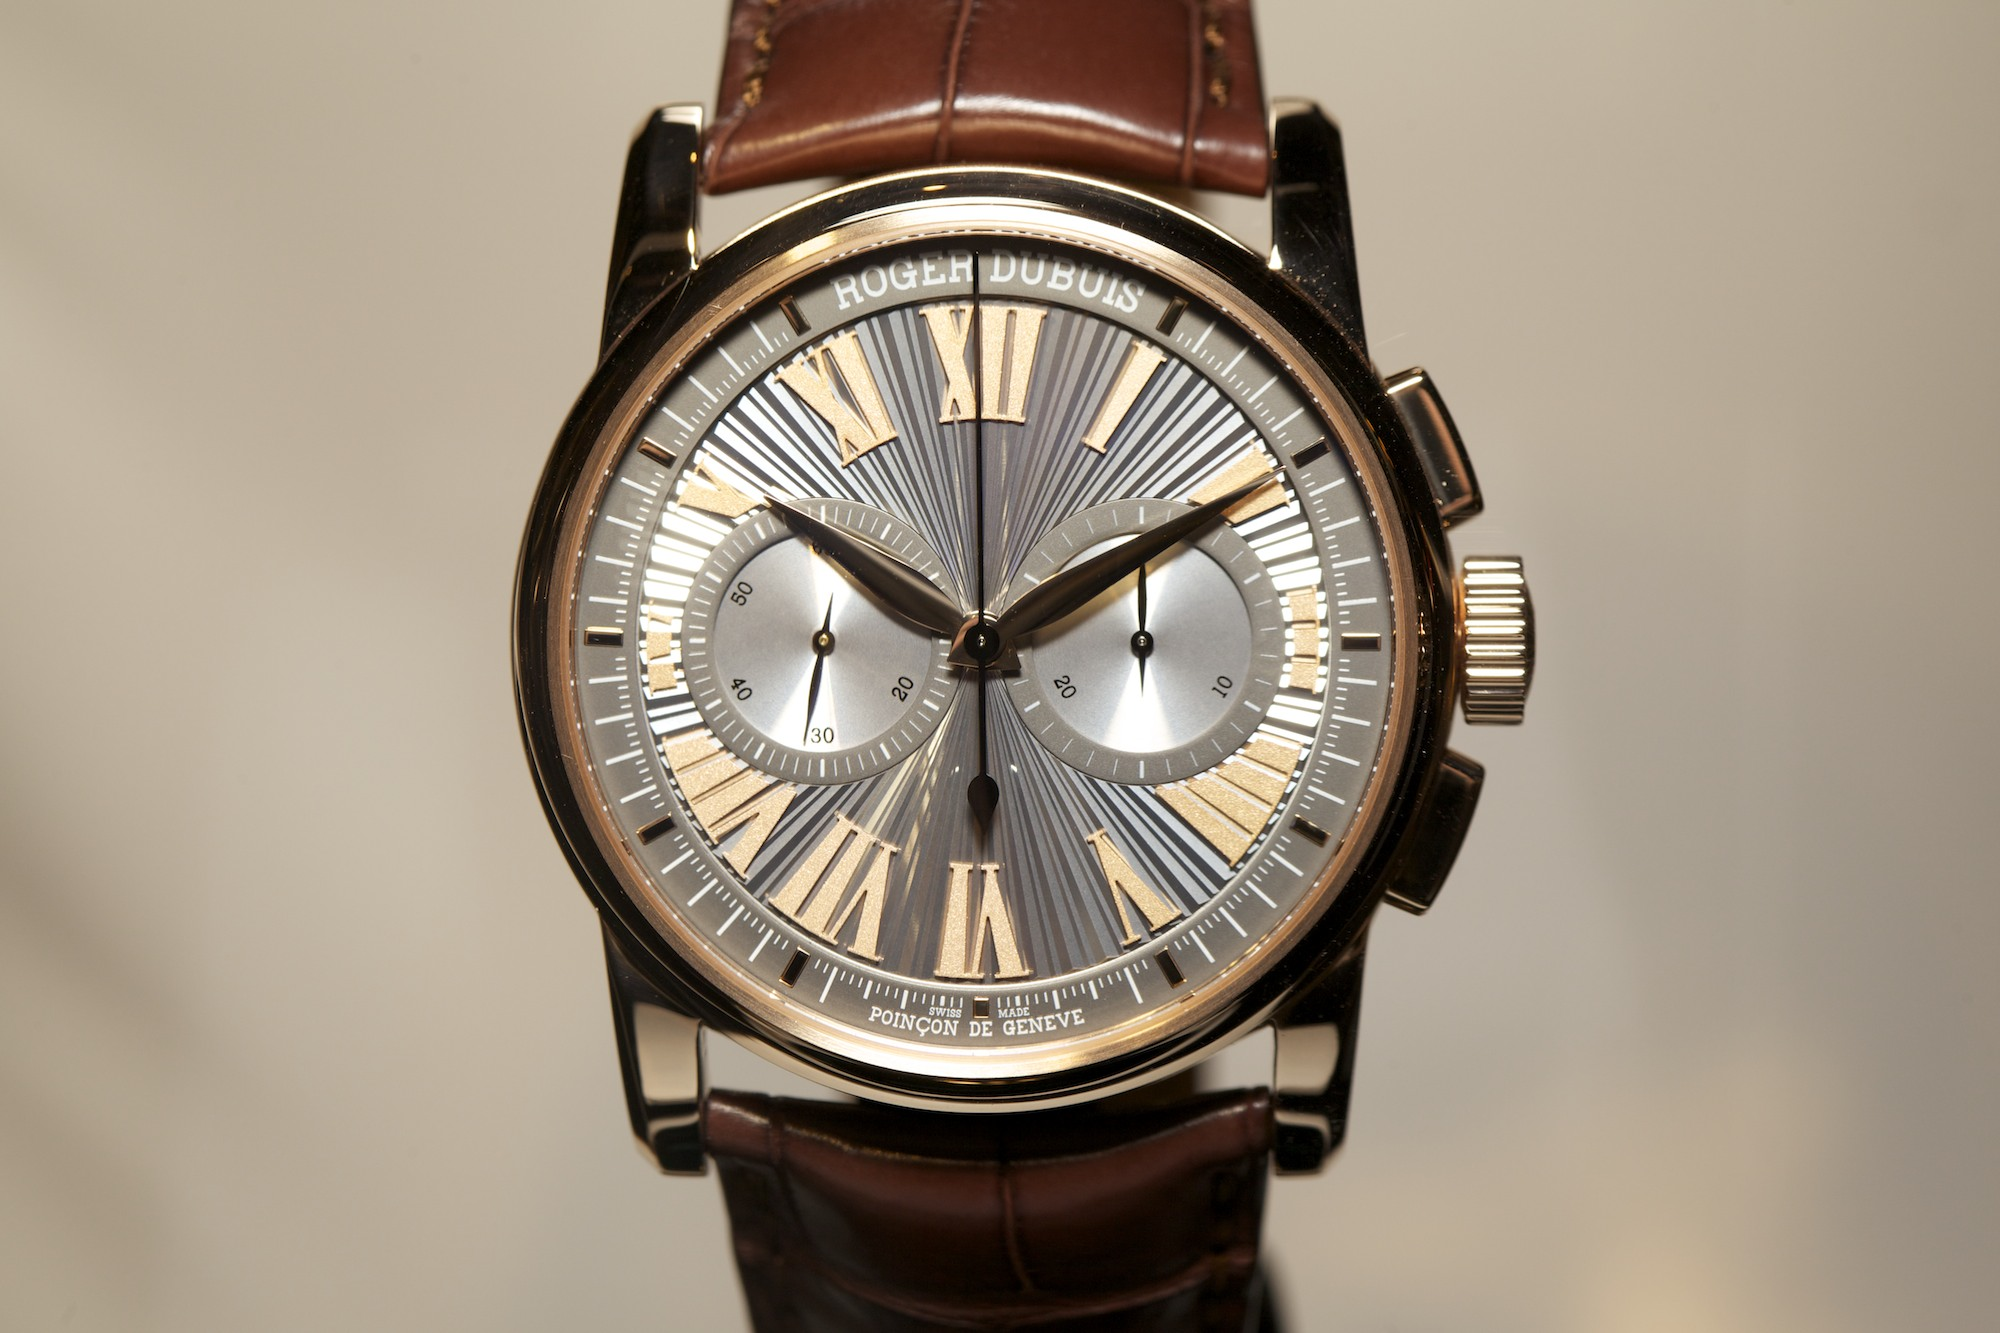 Roger Dubuis RD680 Chronograph